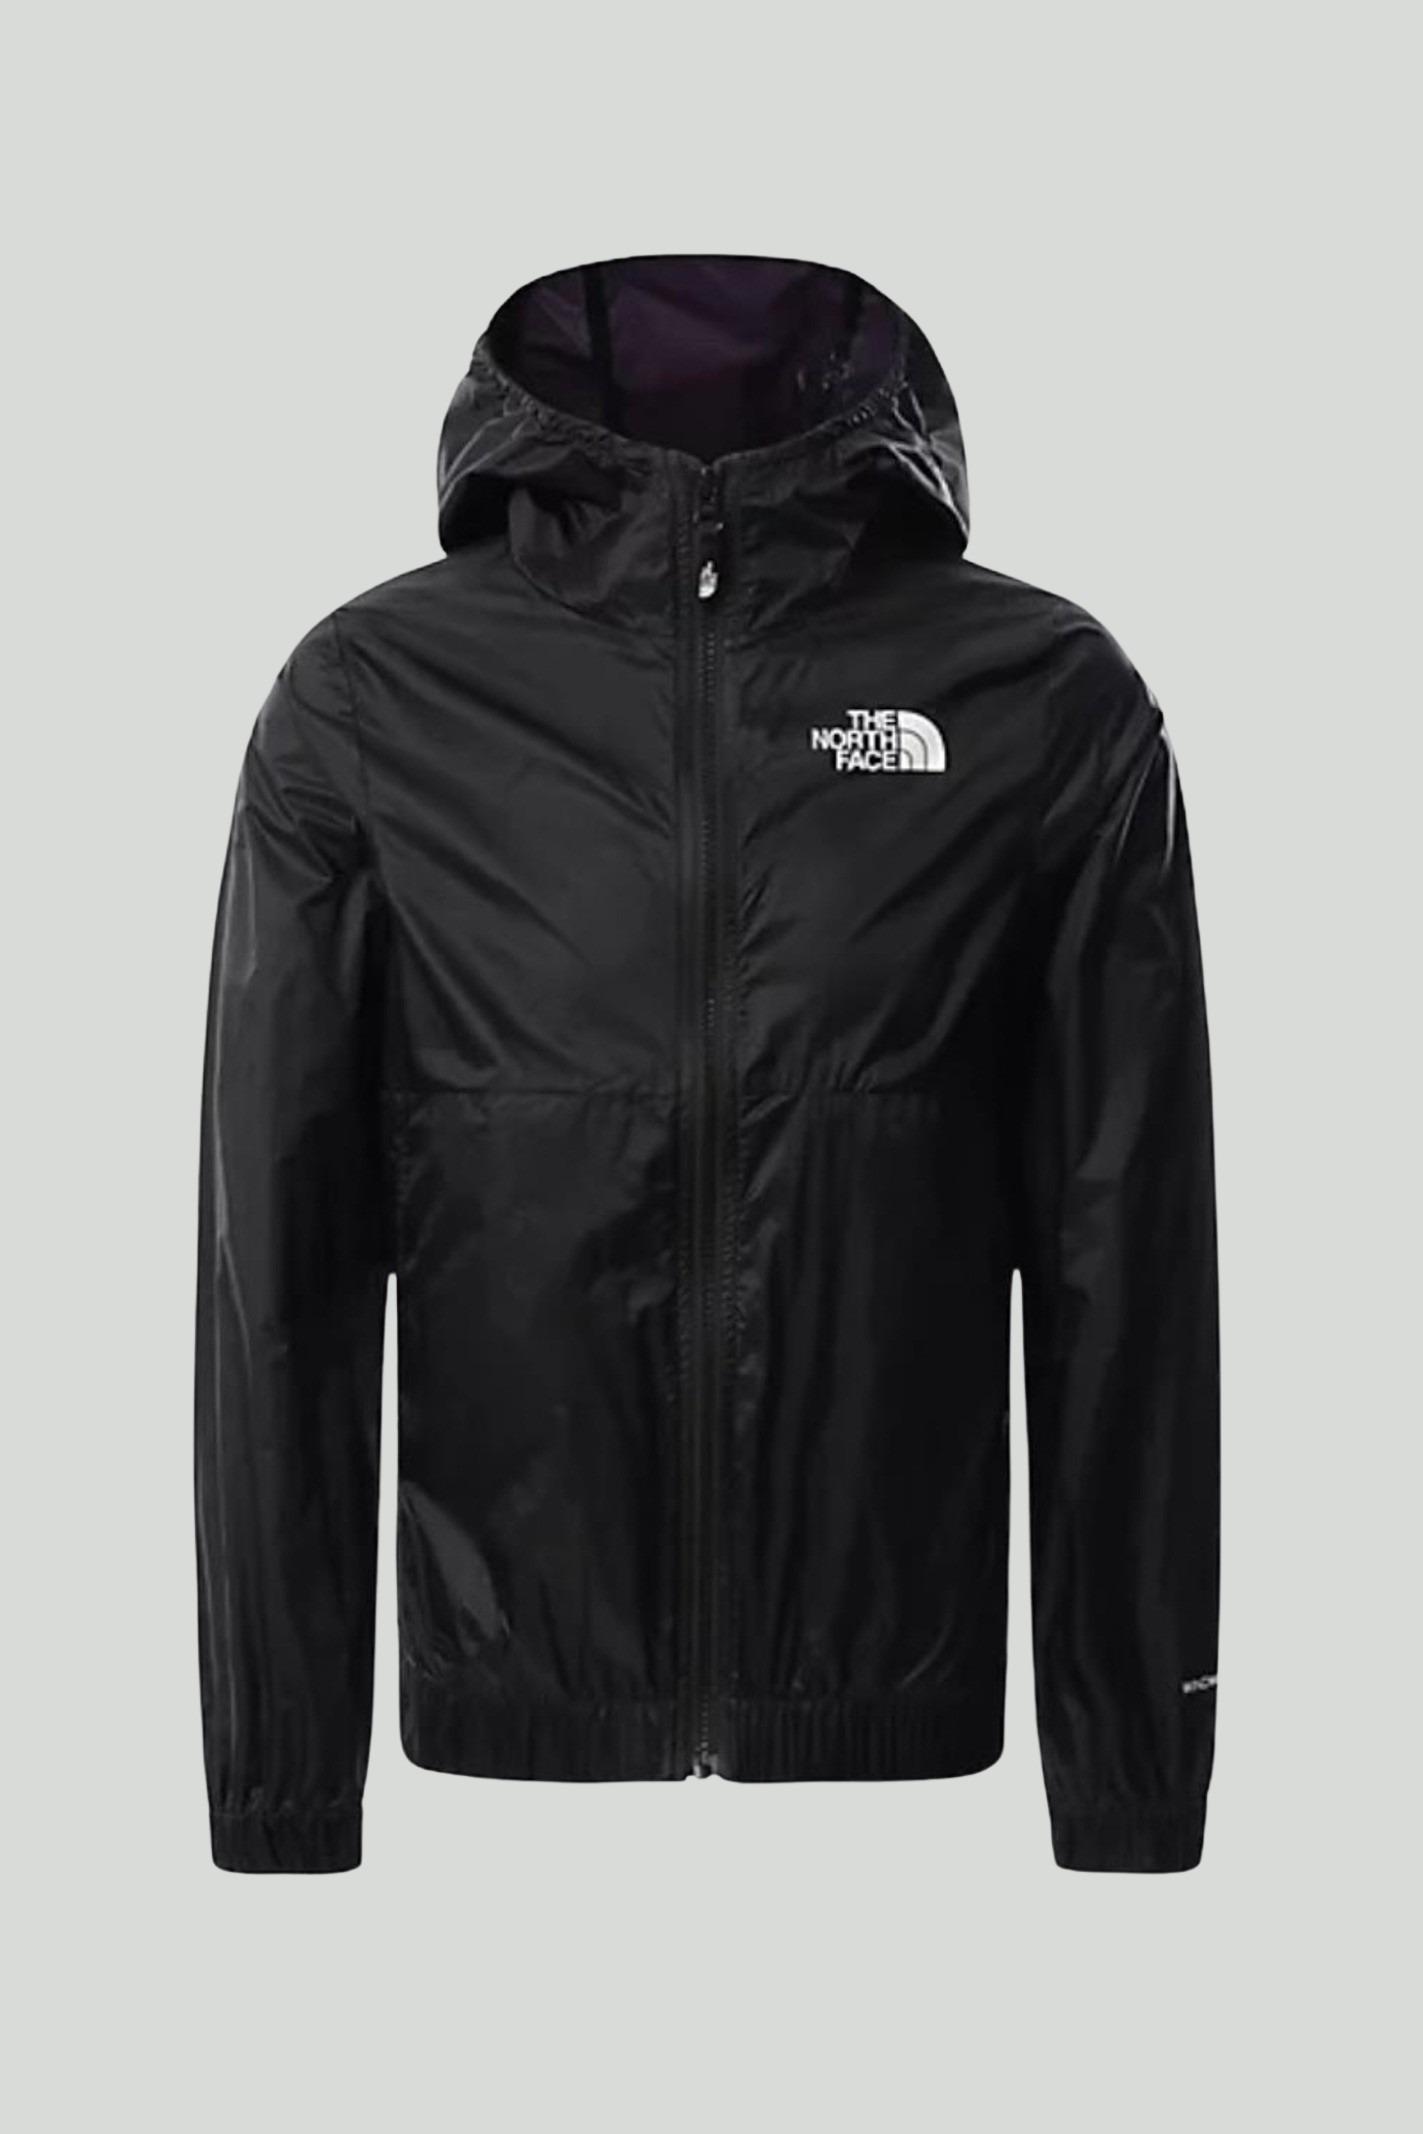 Giubbotto bambino/a nero The north face, modello giacca a vento con cappuccio e zip, e logo frontale a contrasto THE NORTH FACE | Giubbotti | NF0A558JJK31JK31